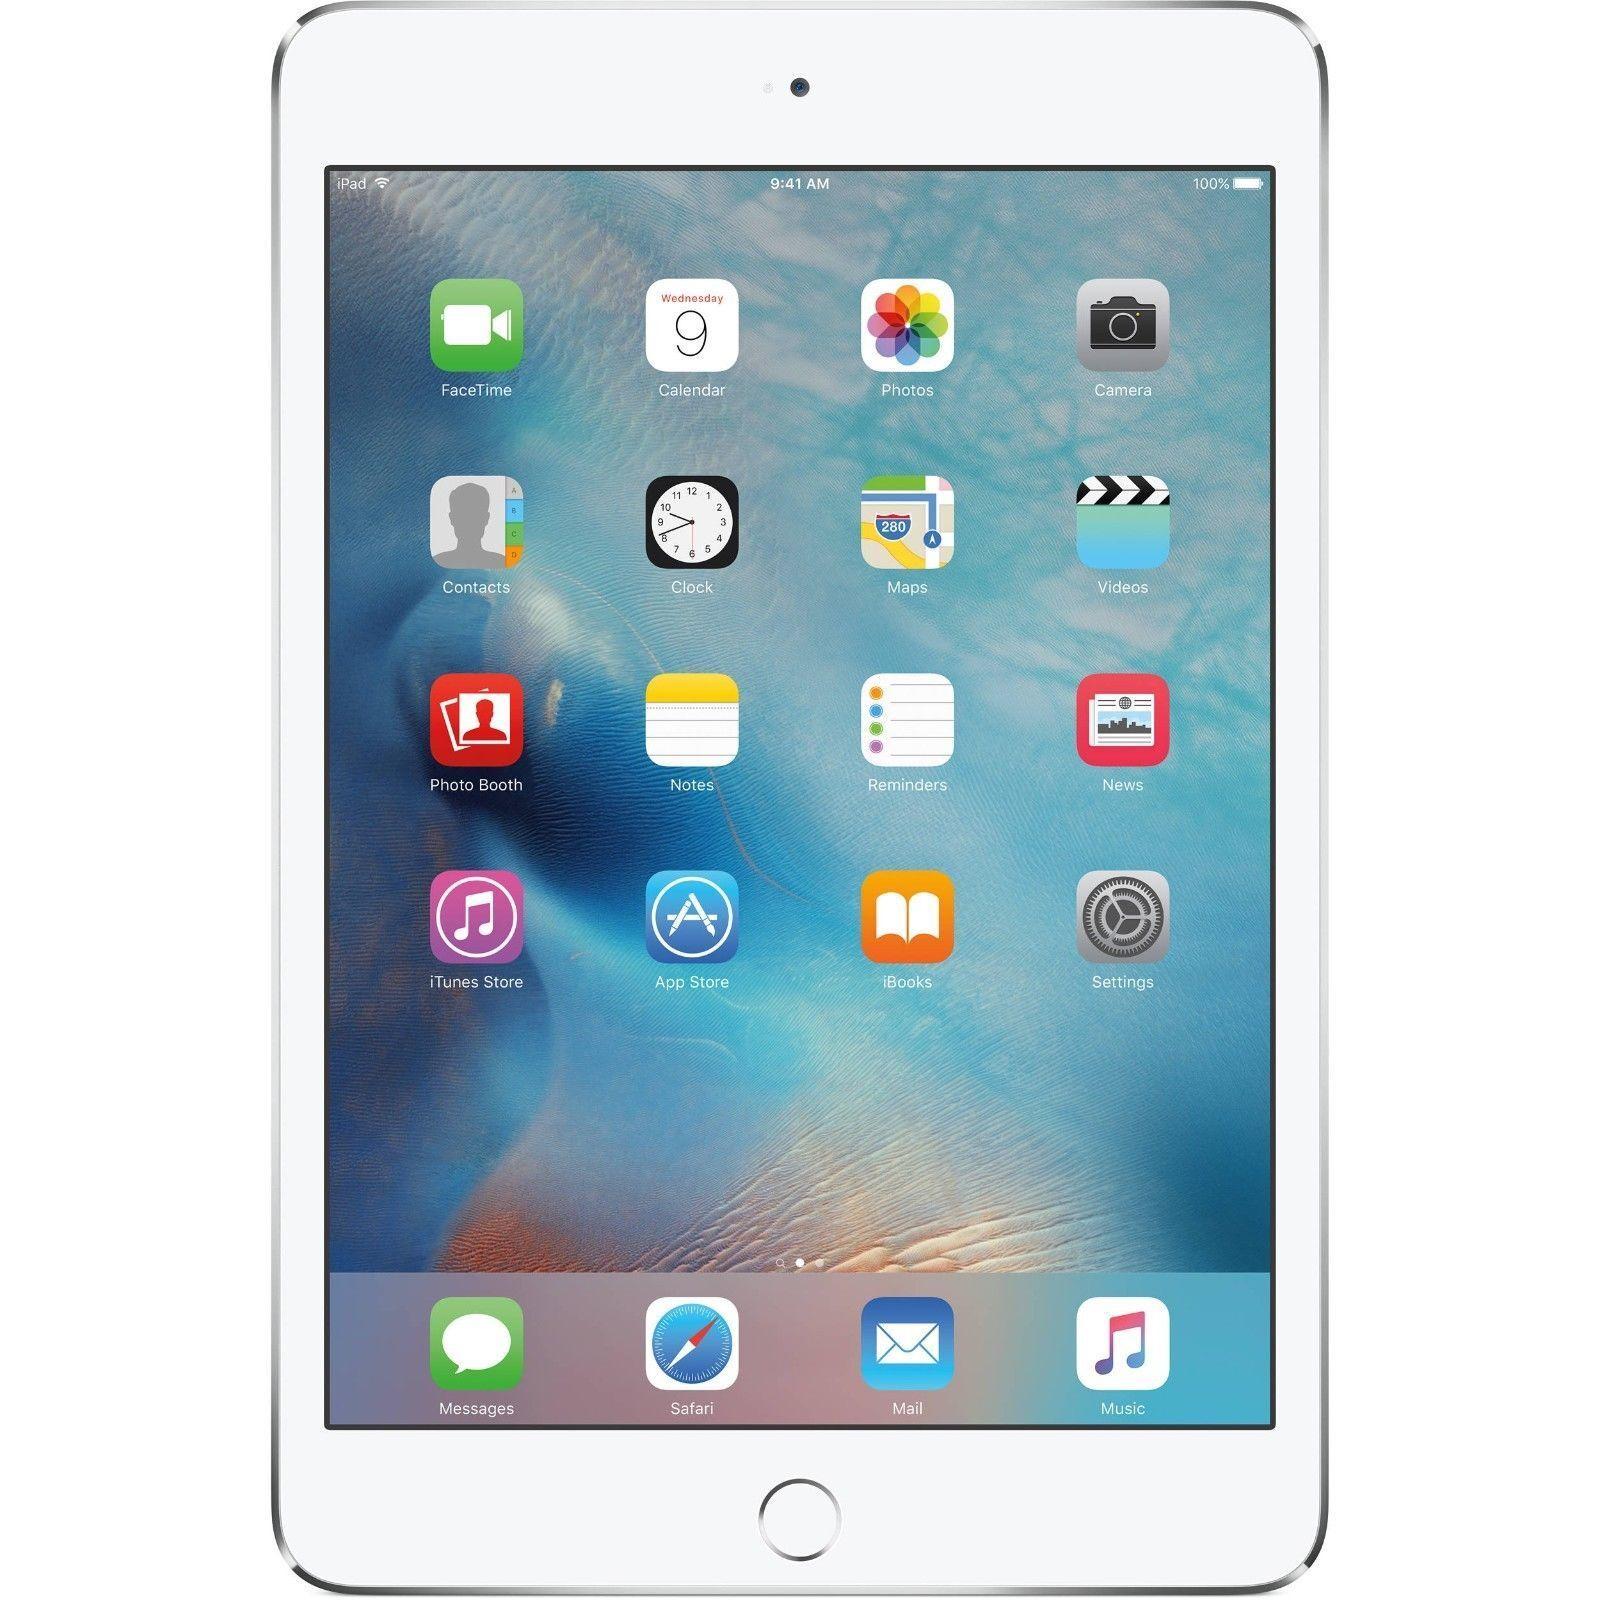 Apple iPad Mini 2 2nd Gen - 16GB, 32GB, 64GB - Wi-Fi 7.9in - Gray Silver